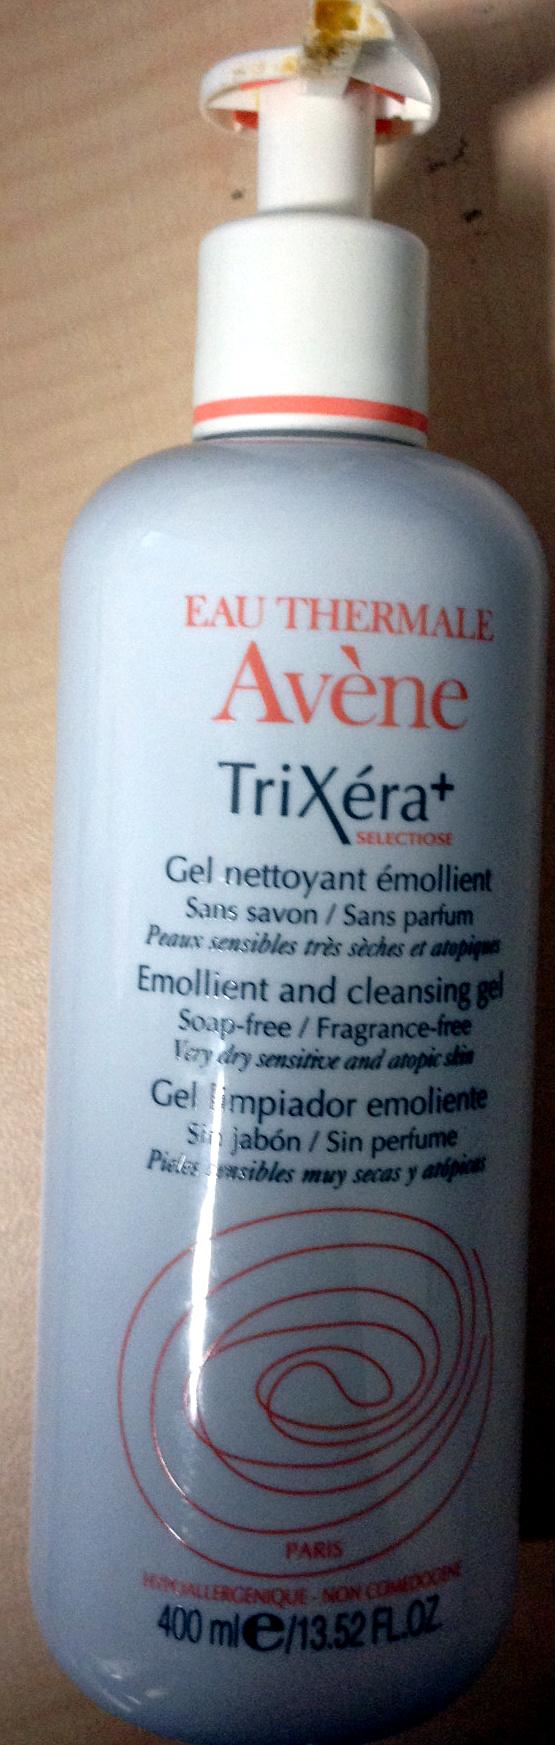 Trixéra+ - Product - fr